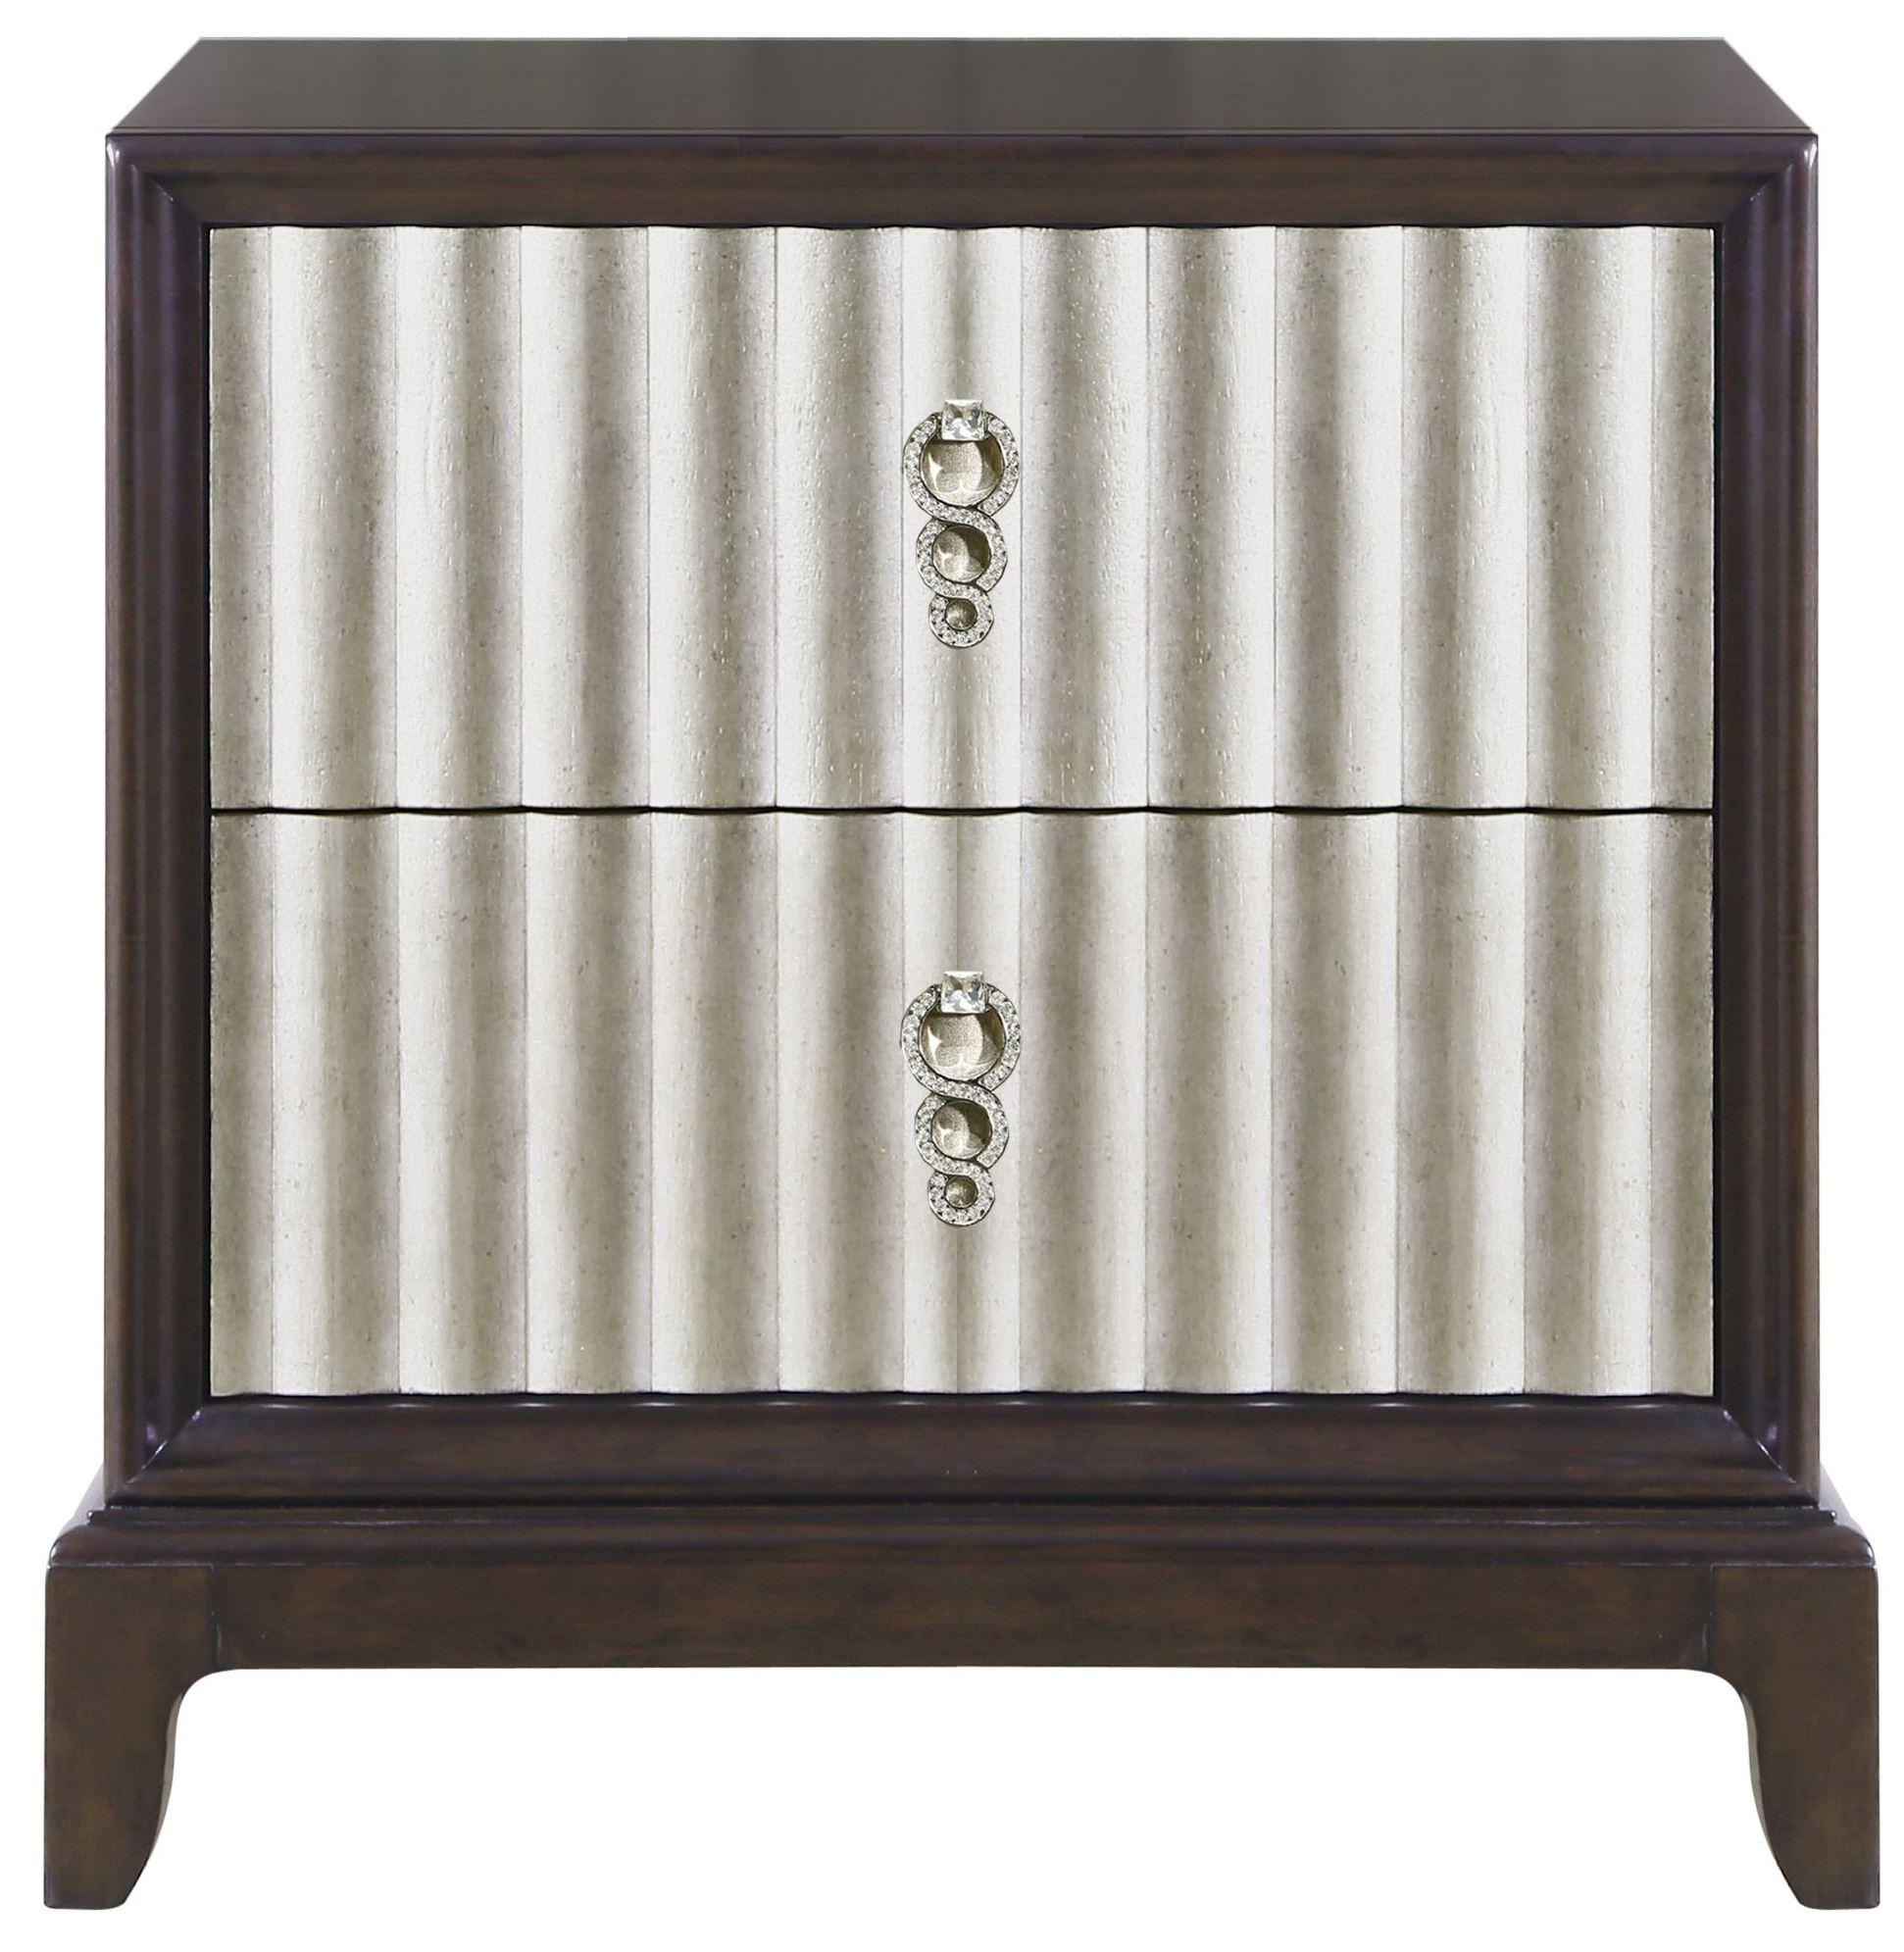 Gramercy Sable Panel Upholstered Bedroom Set From Magnussen Home B3564 54h 54f 54r Coleman